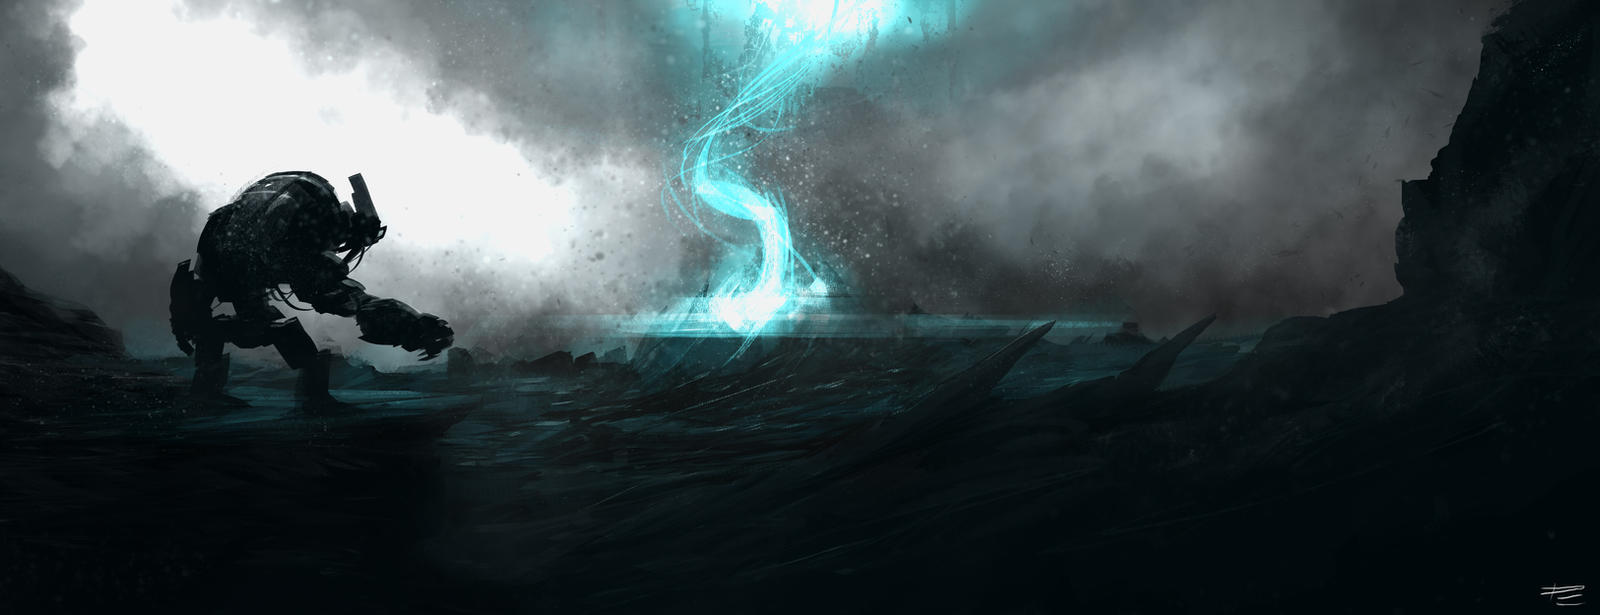 Half Life 2: Episode 2, Citadel Meltdown - Fan Art by Azagth